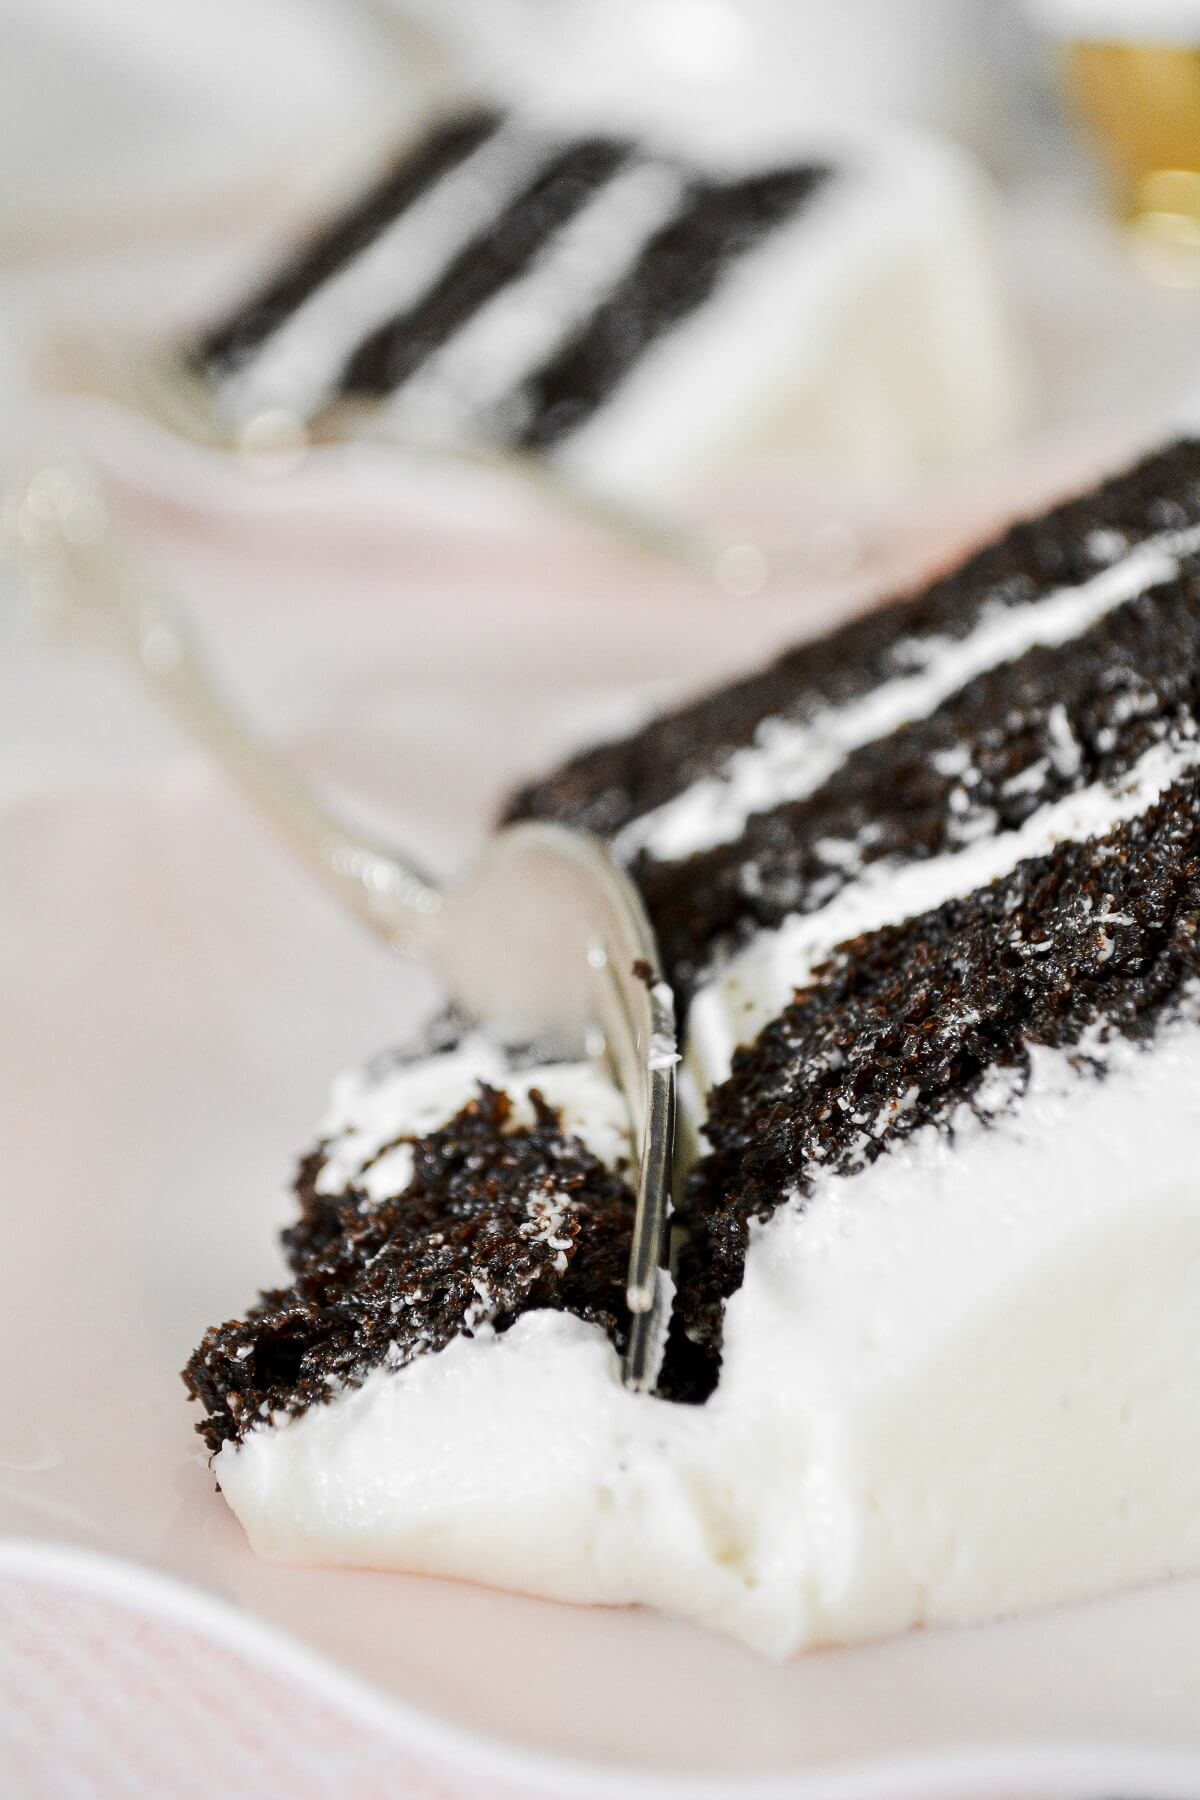 A closeup of a slice of chocolate and vanilla sour cream cake.